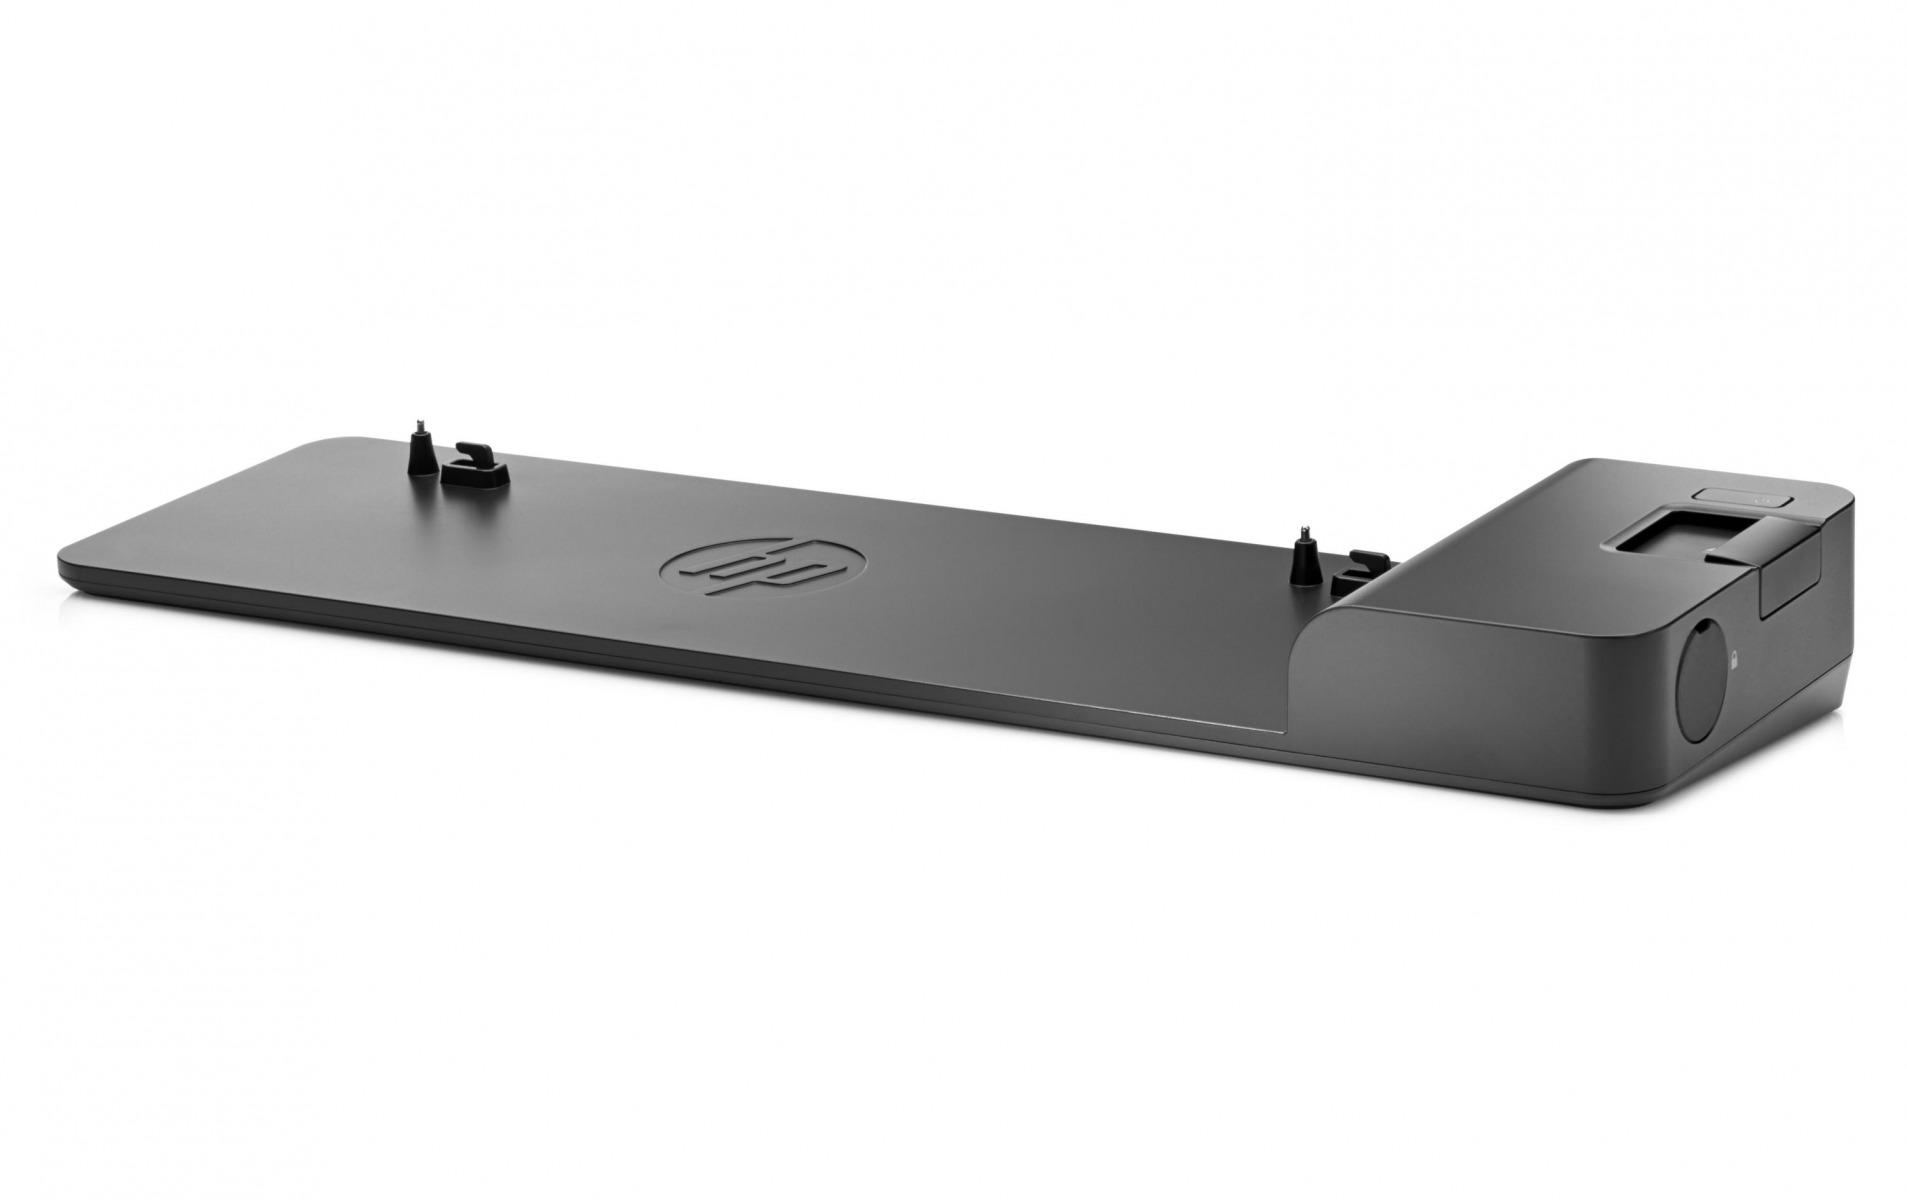 Image of HP Dockingstation 2013 UltraSlim D9Y32AA